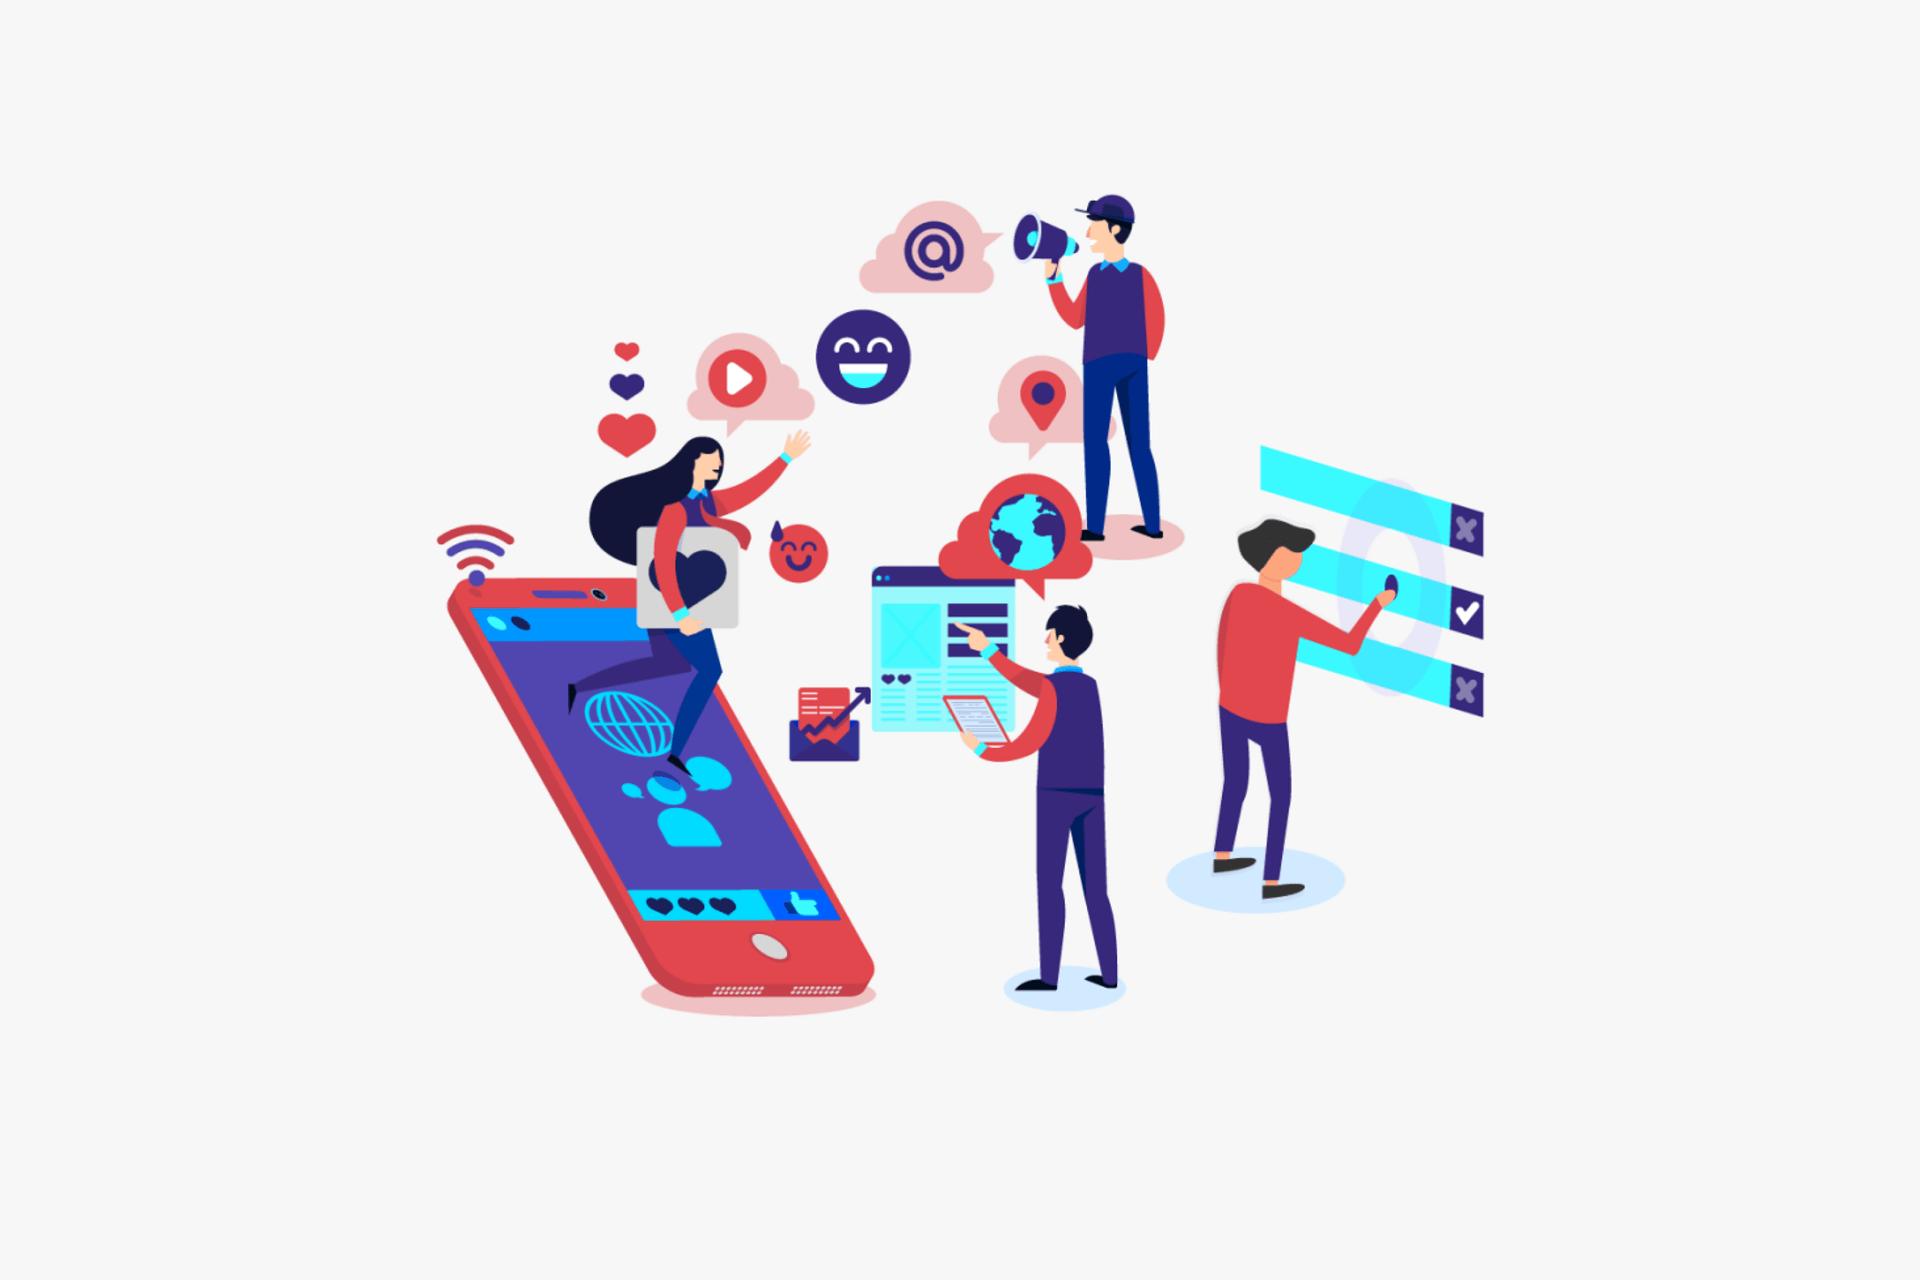 Weltweite Vernetzung - Social Media Illustration